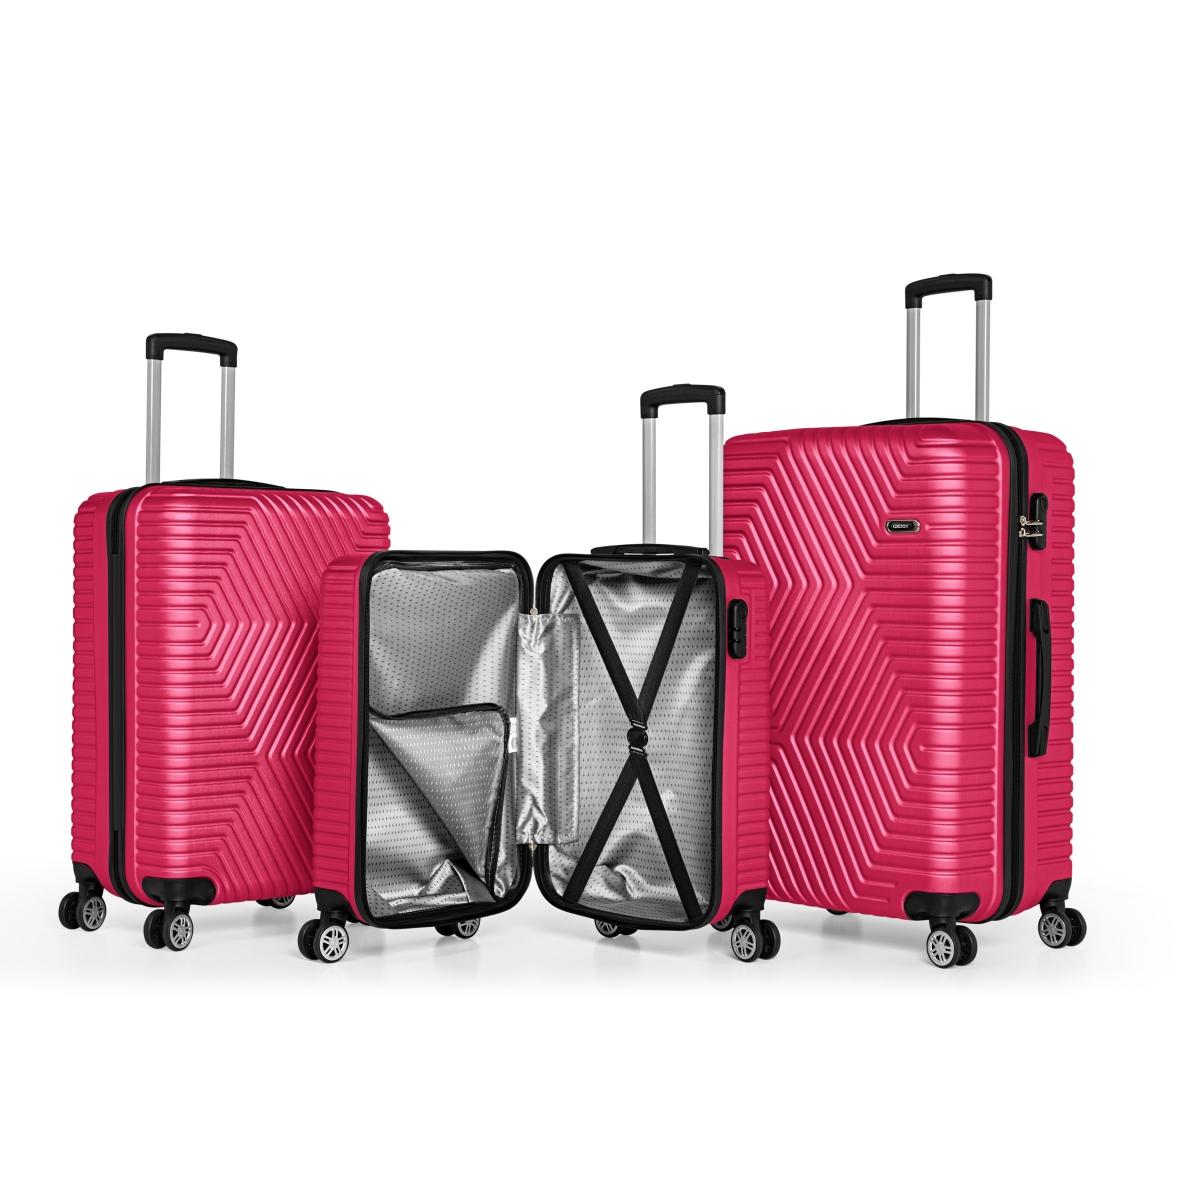 G&D Polo Suitcase ABS 3'lü Lüx Valiz Seyahat Seti - Model:600.10 Fuşya Pembe